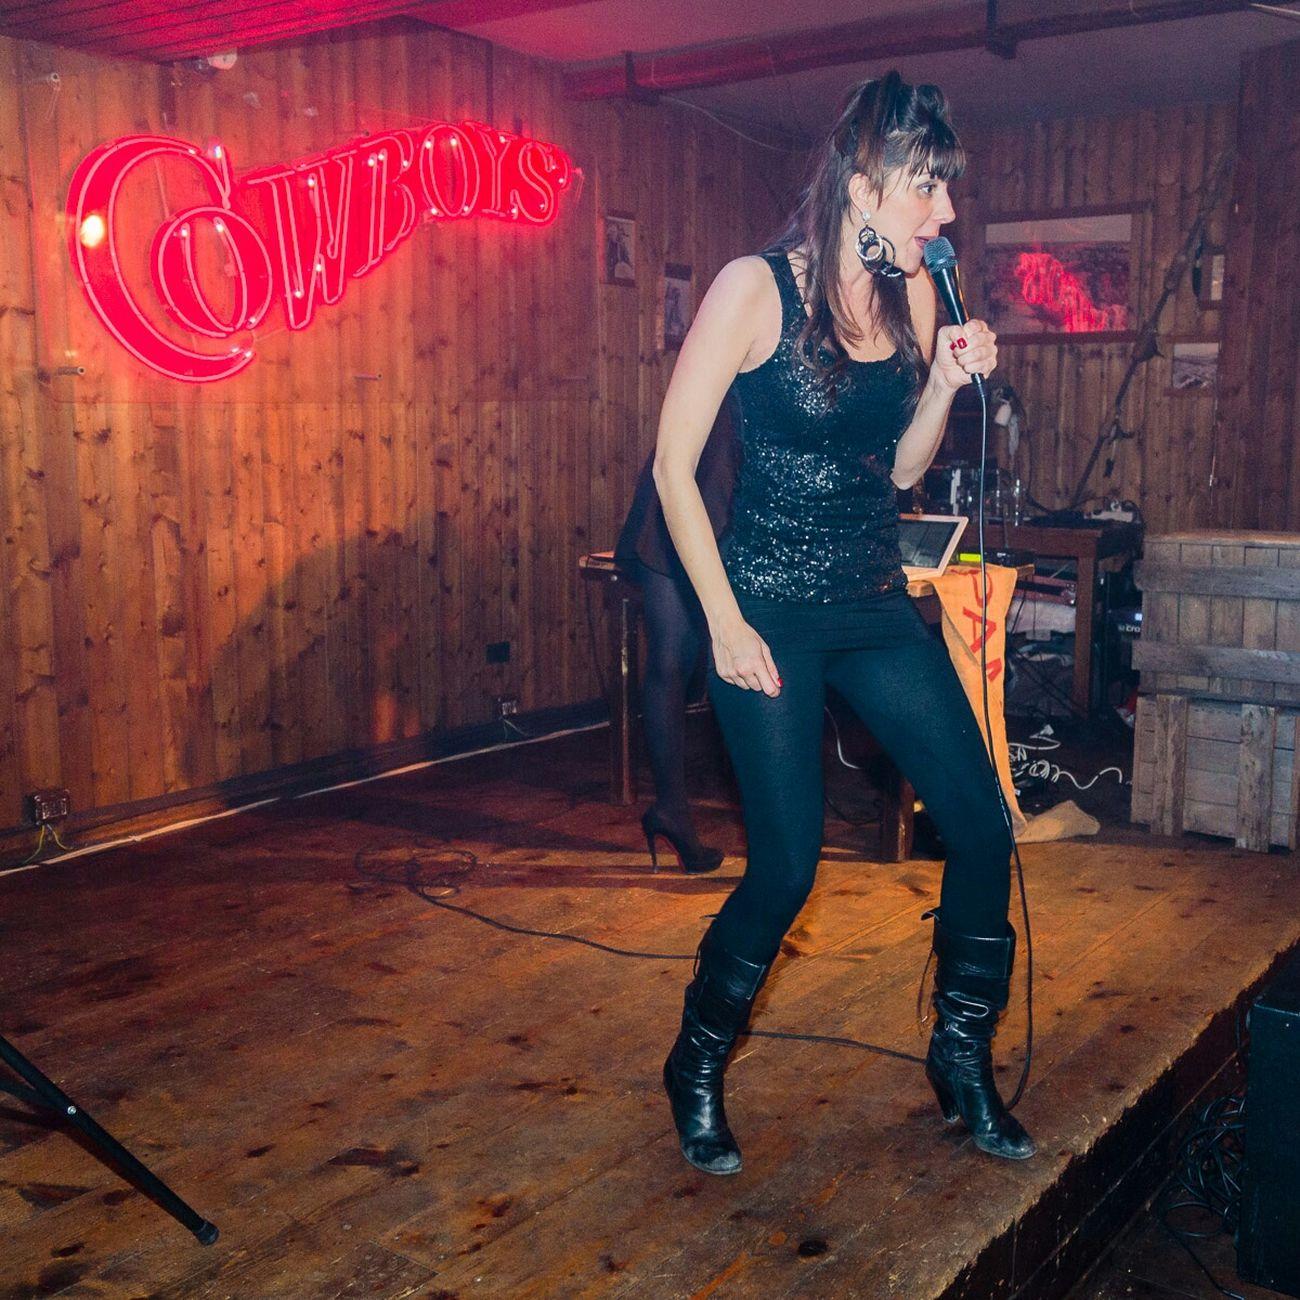 Cowboyland Voghera Ary & Giuly Nightlife